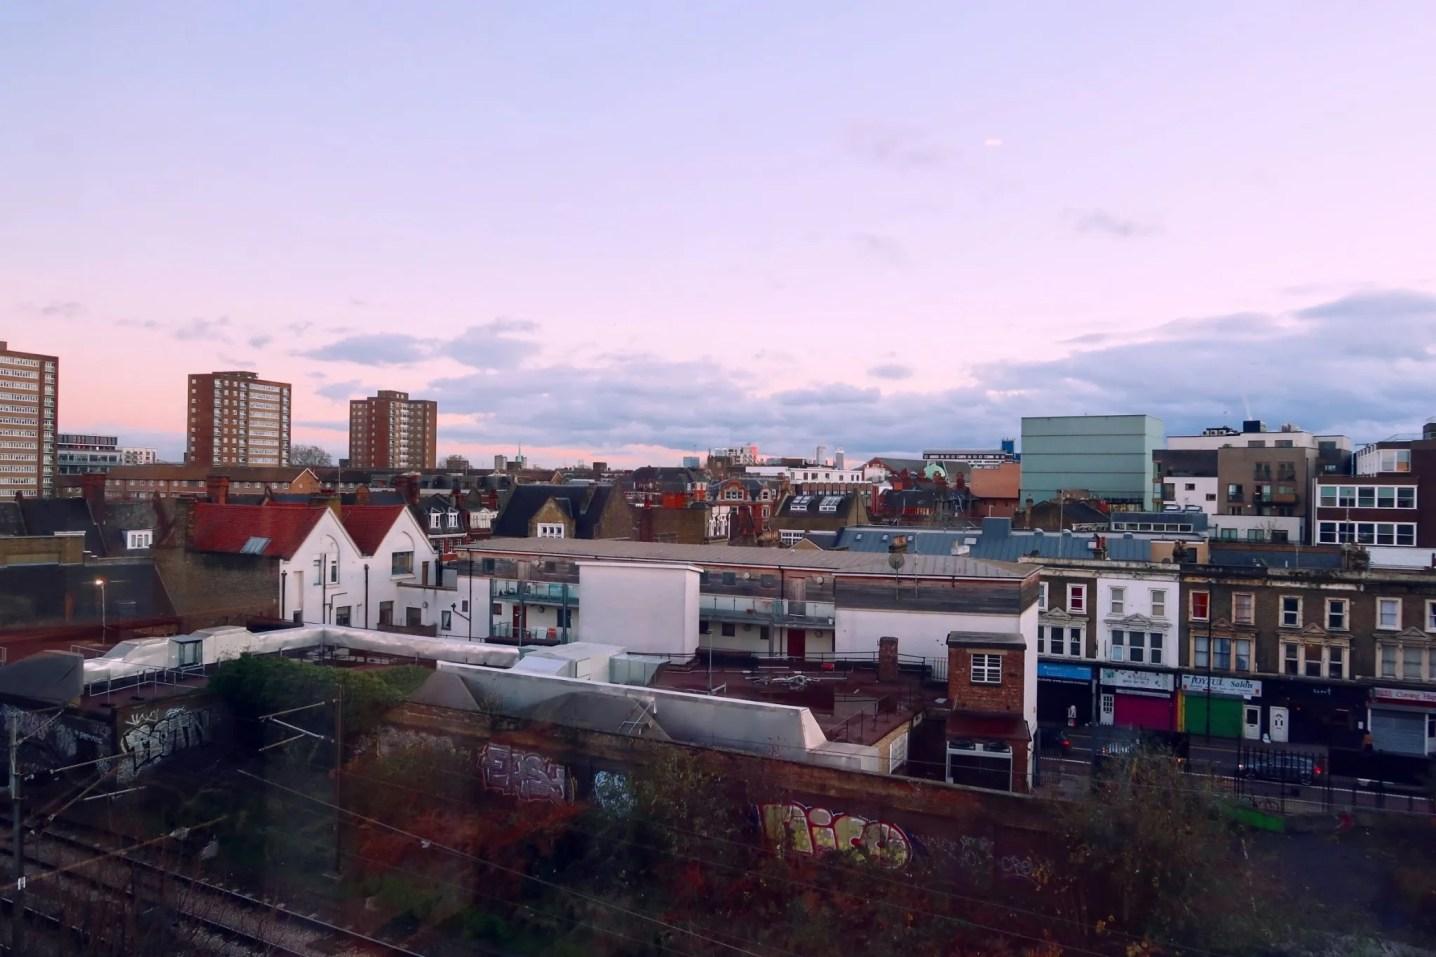 Kip Hotel Hackney @minkaguides view 2